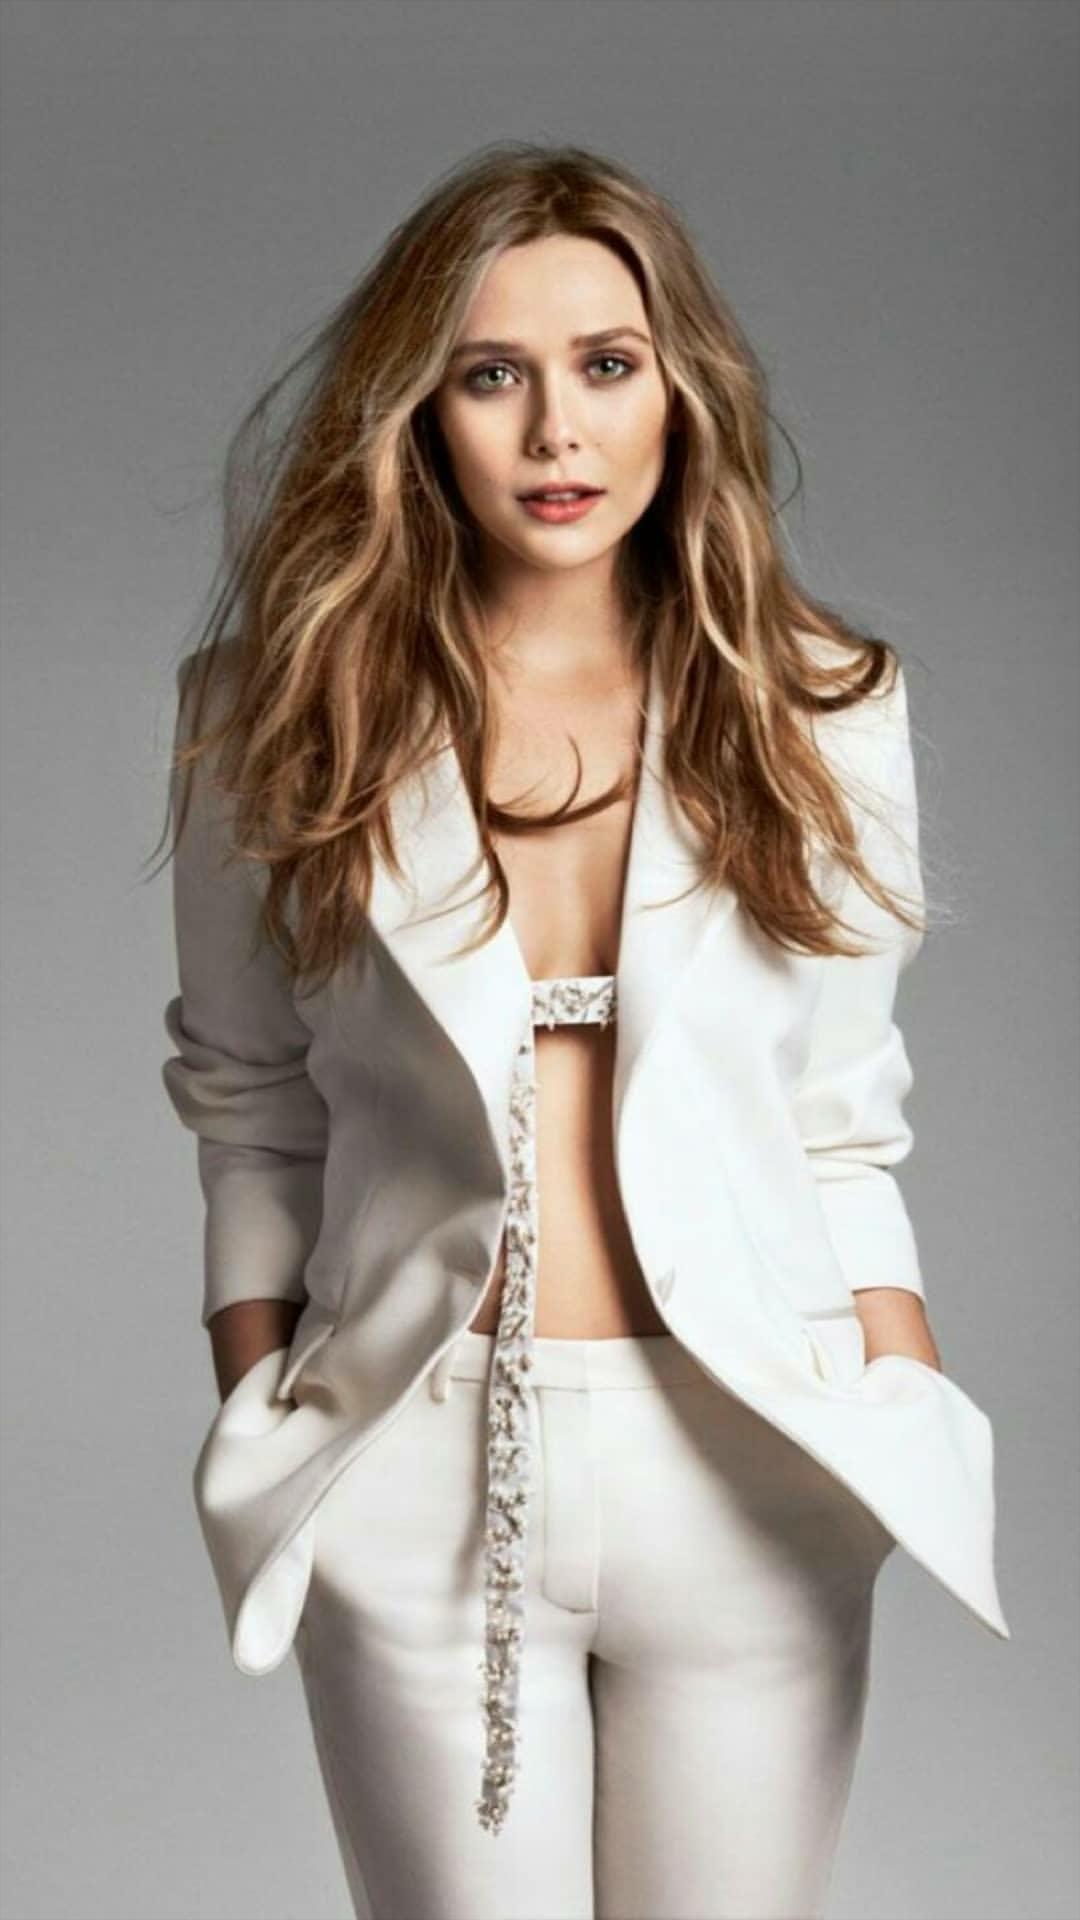 Pin By Amr M Nosseir On Celebrities Elizabeth Olsen Bikini Clothes Design Elizabeth Olsen